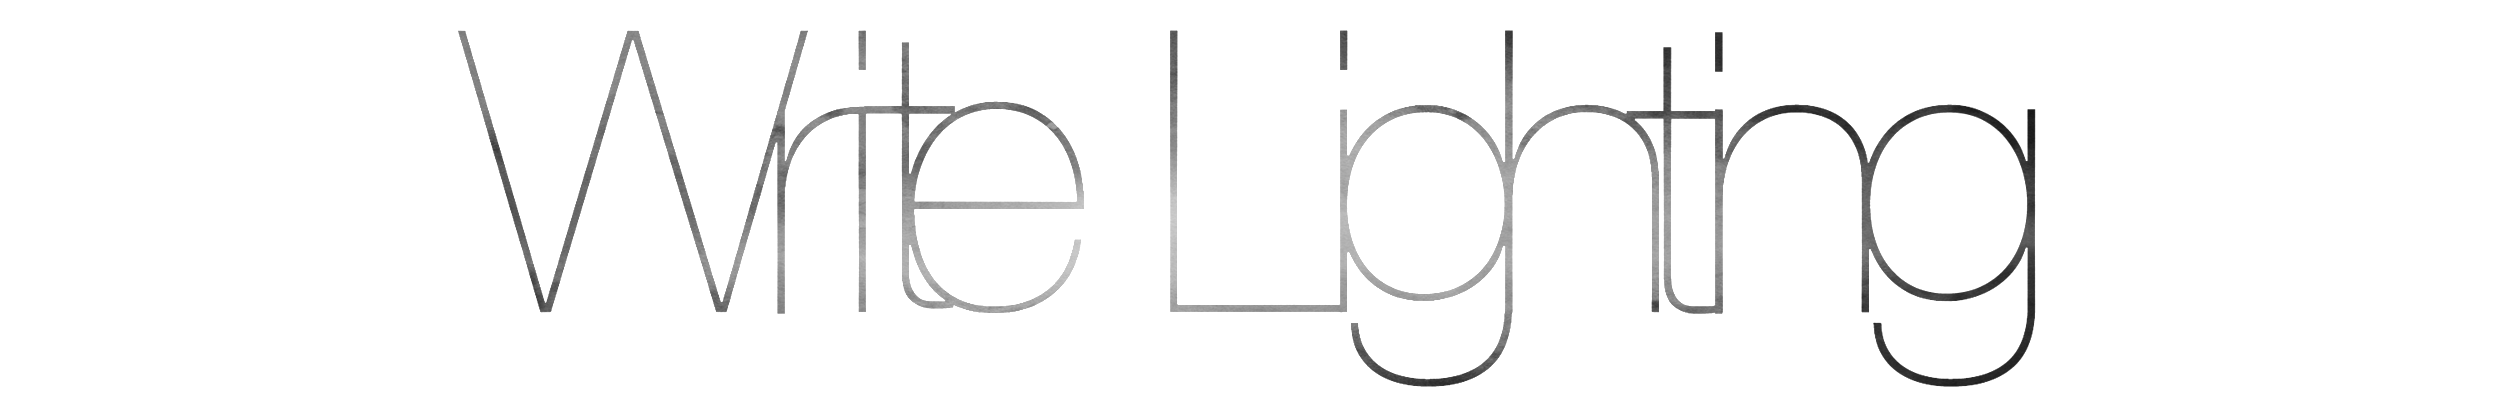 D.J. Logo (Alone) Wide.png